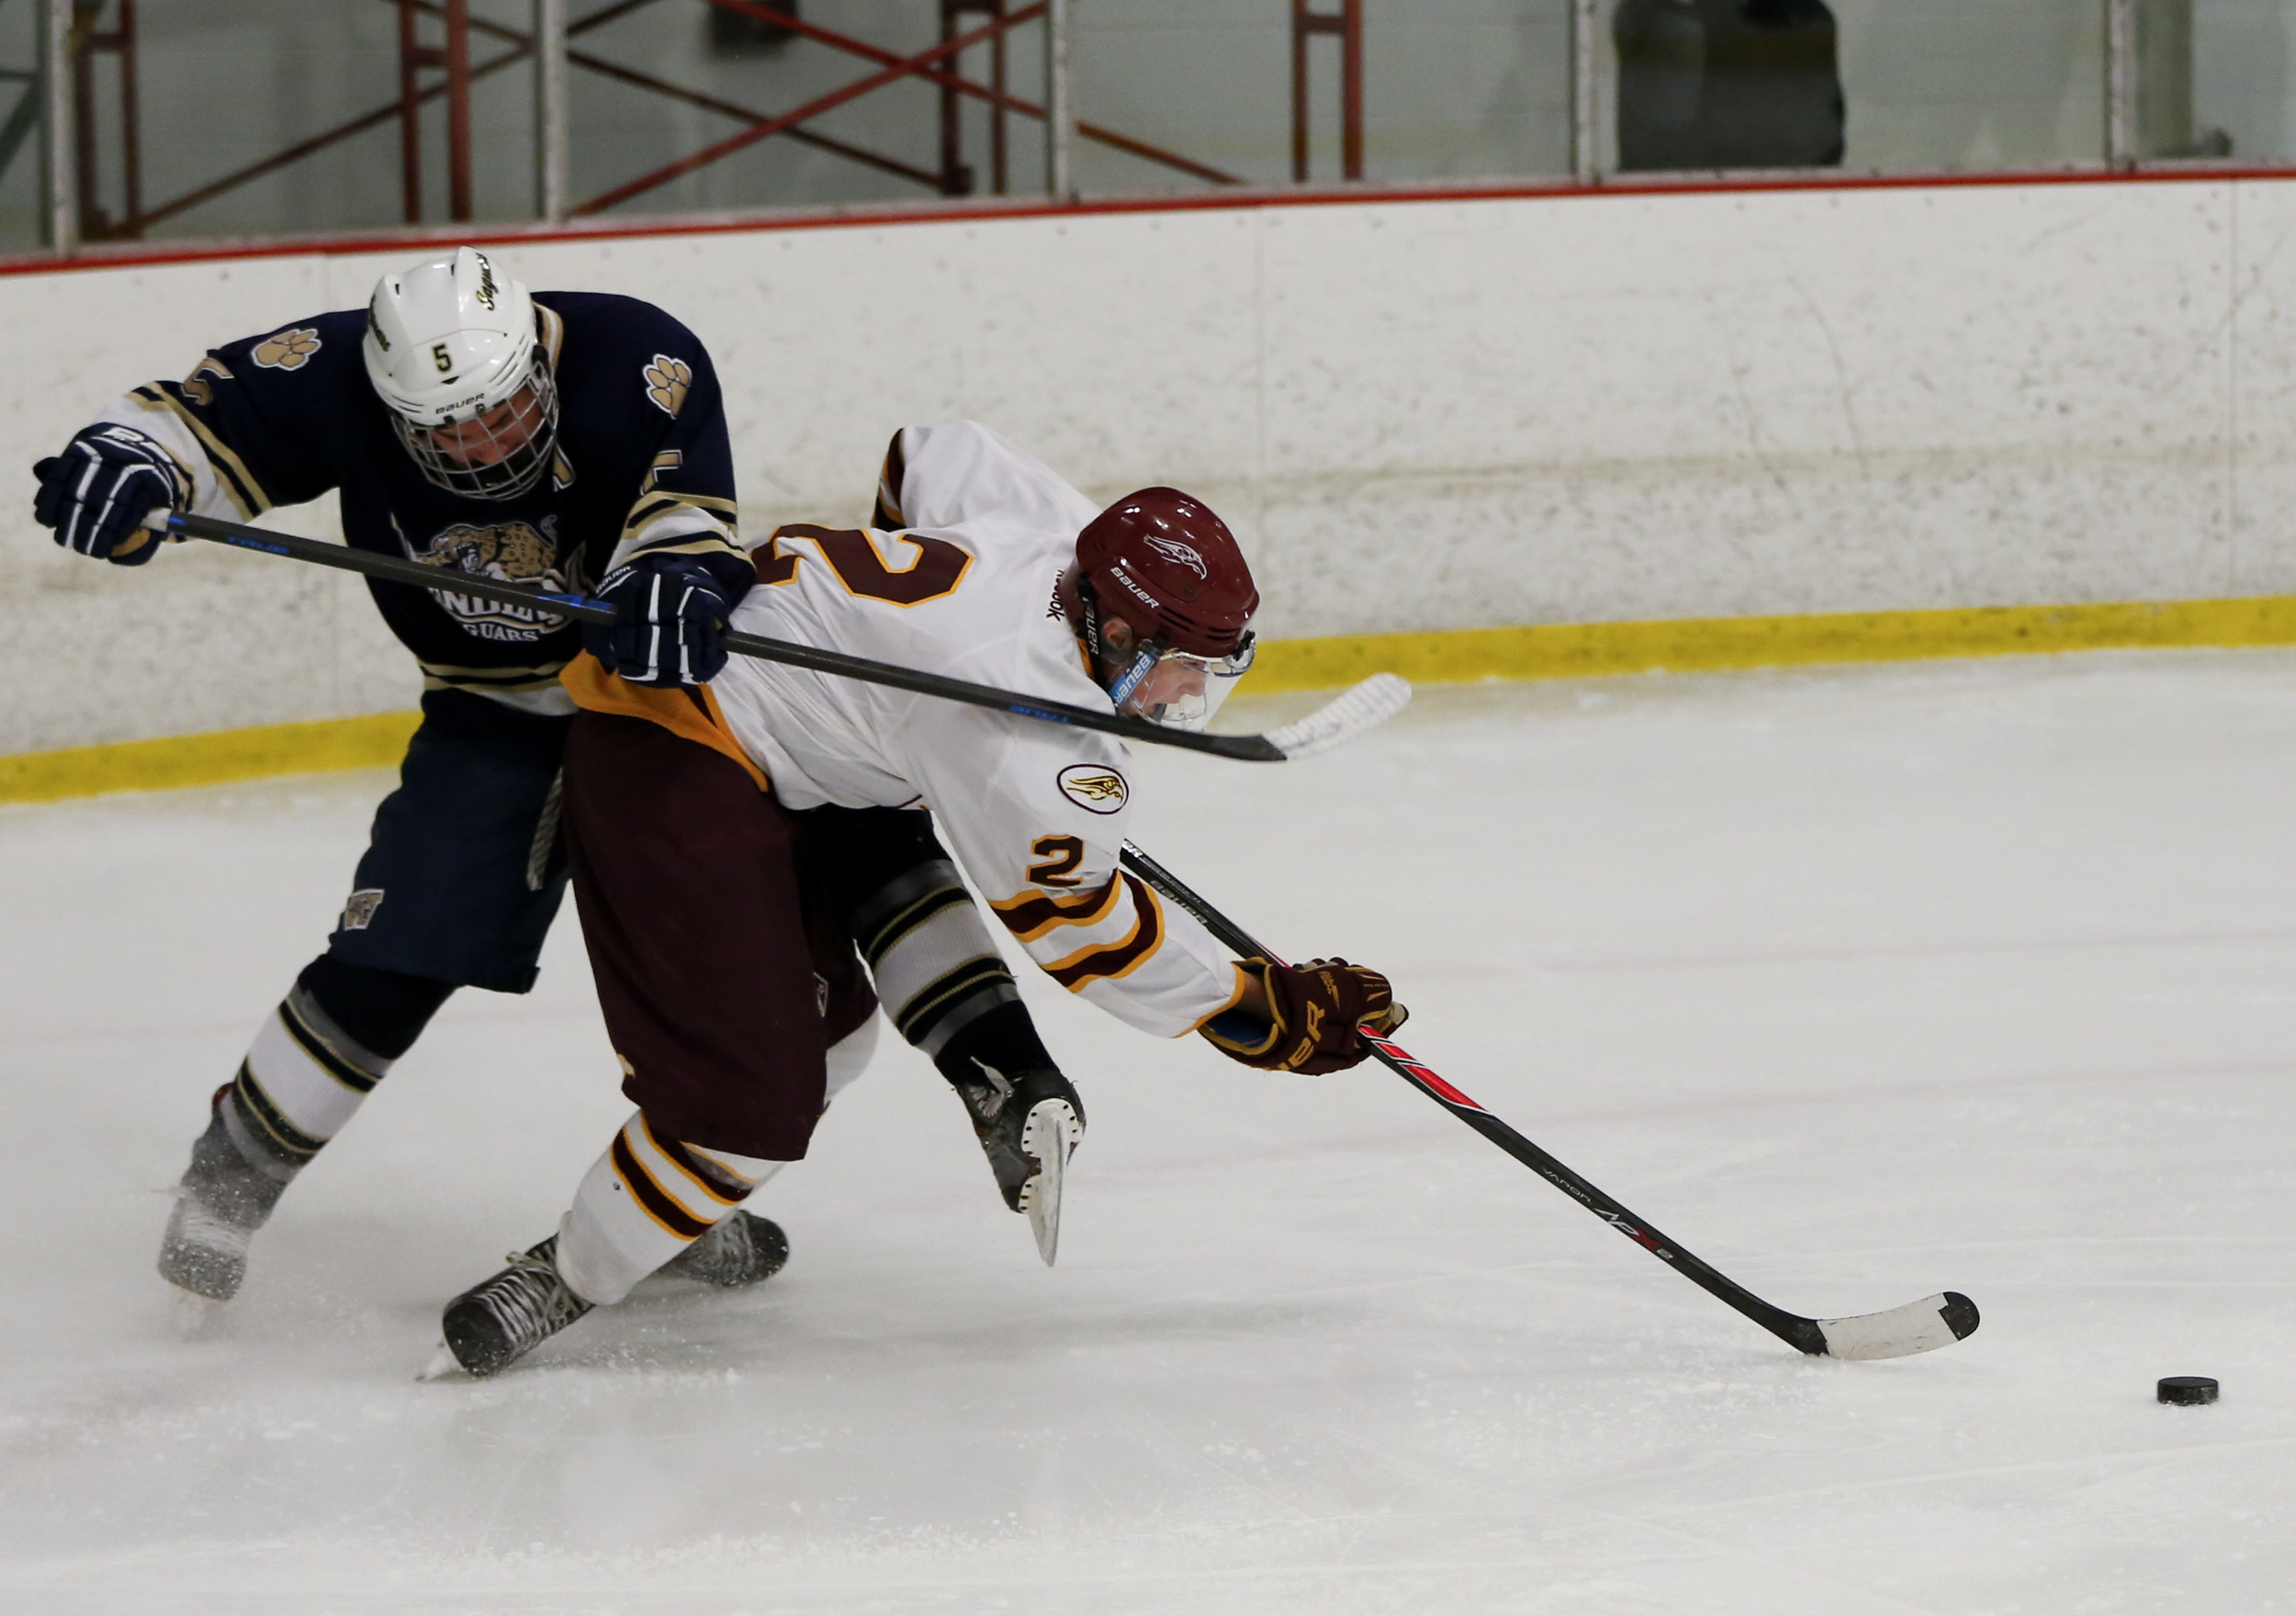 20150107-vn-lebhockey-ss-441.JPG